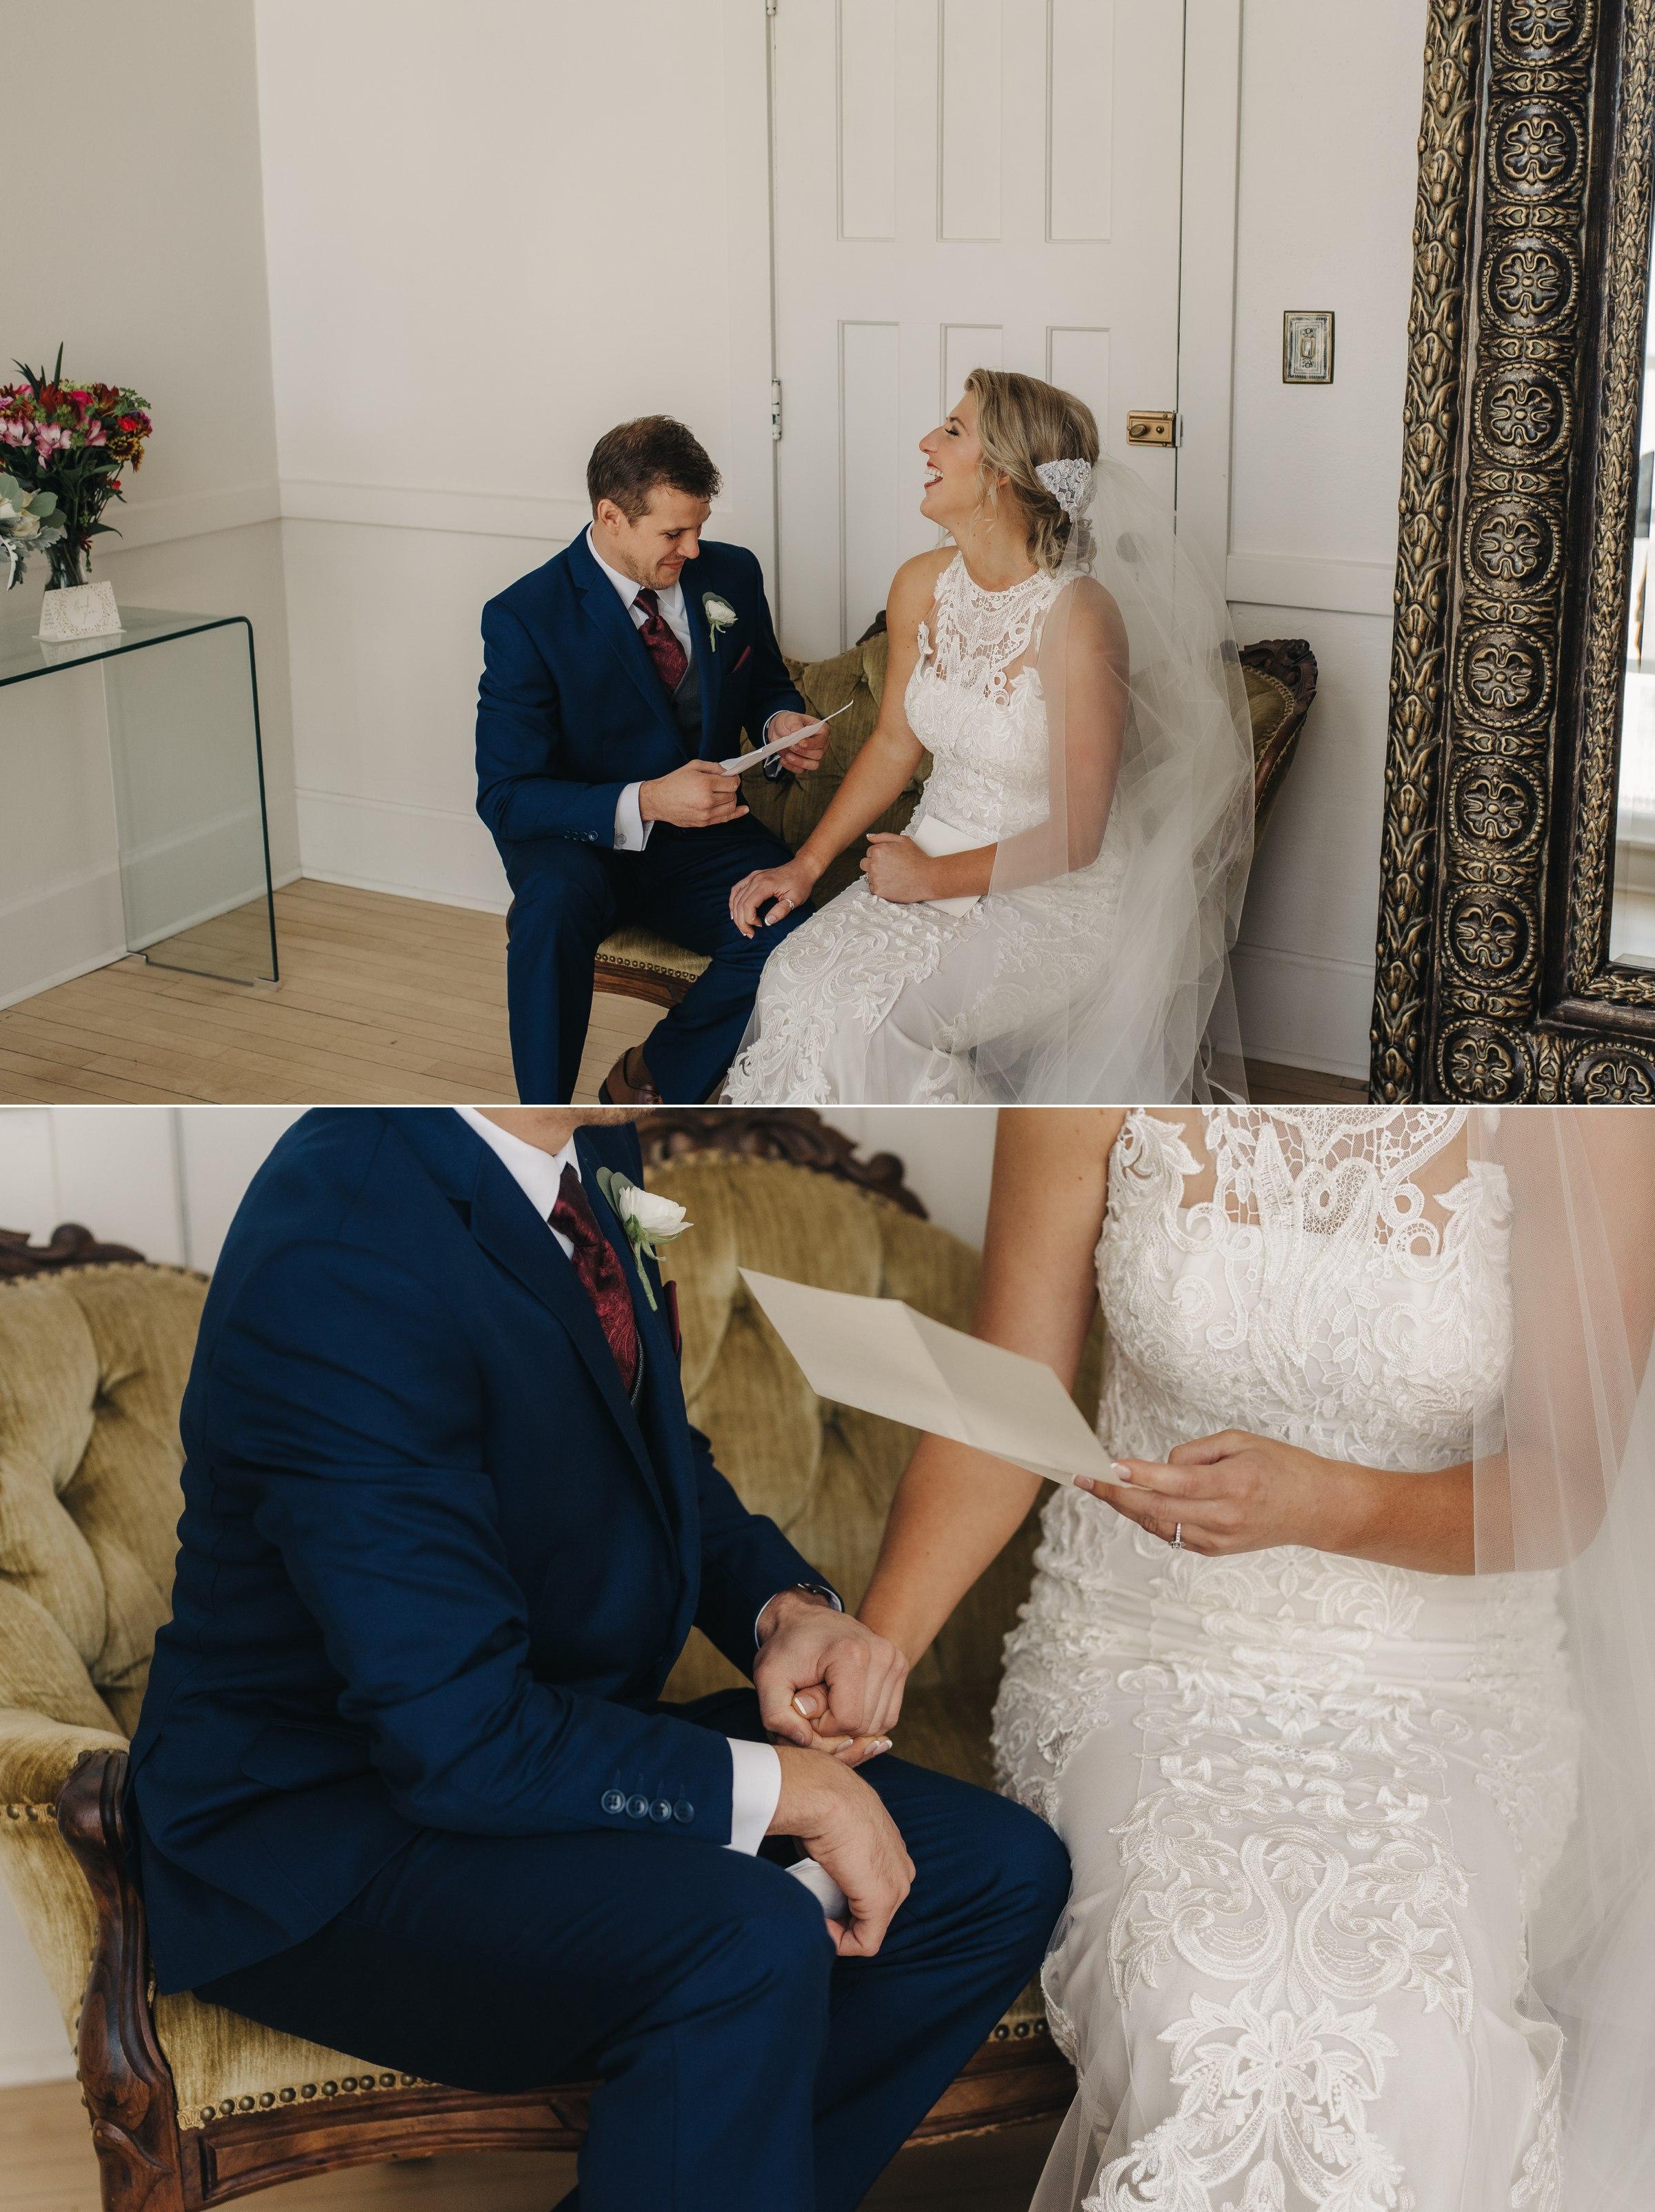 elopement-photographer-austin-best-wedding-minneapolis-adventurous-wedding-modern-morocco-new york-new orleans-mexica-costa rica-italy-affordable-best_0042.jpg